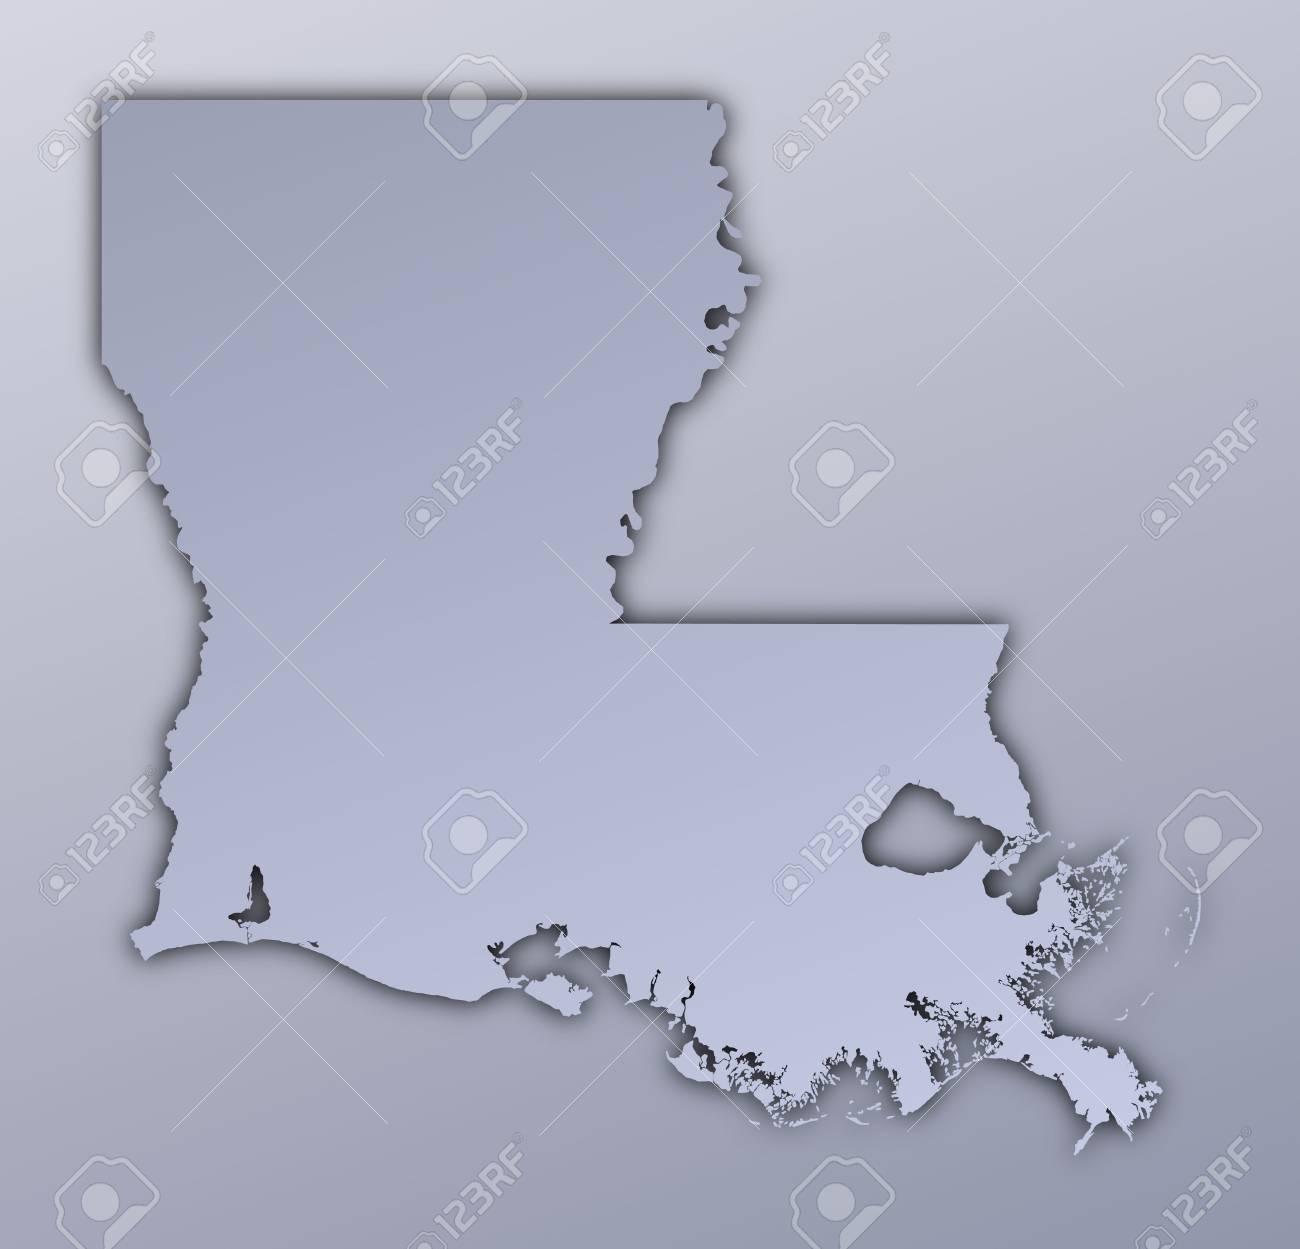 Louisiana Usa Map Filled With Metallic Gradient Mercator